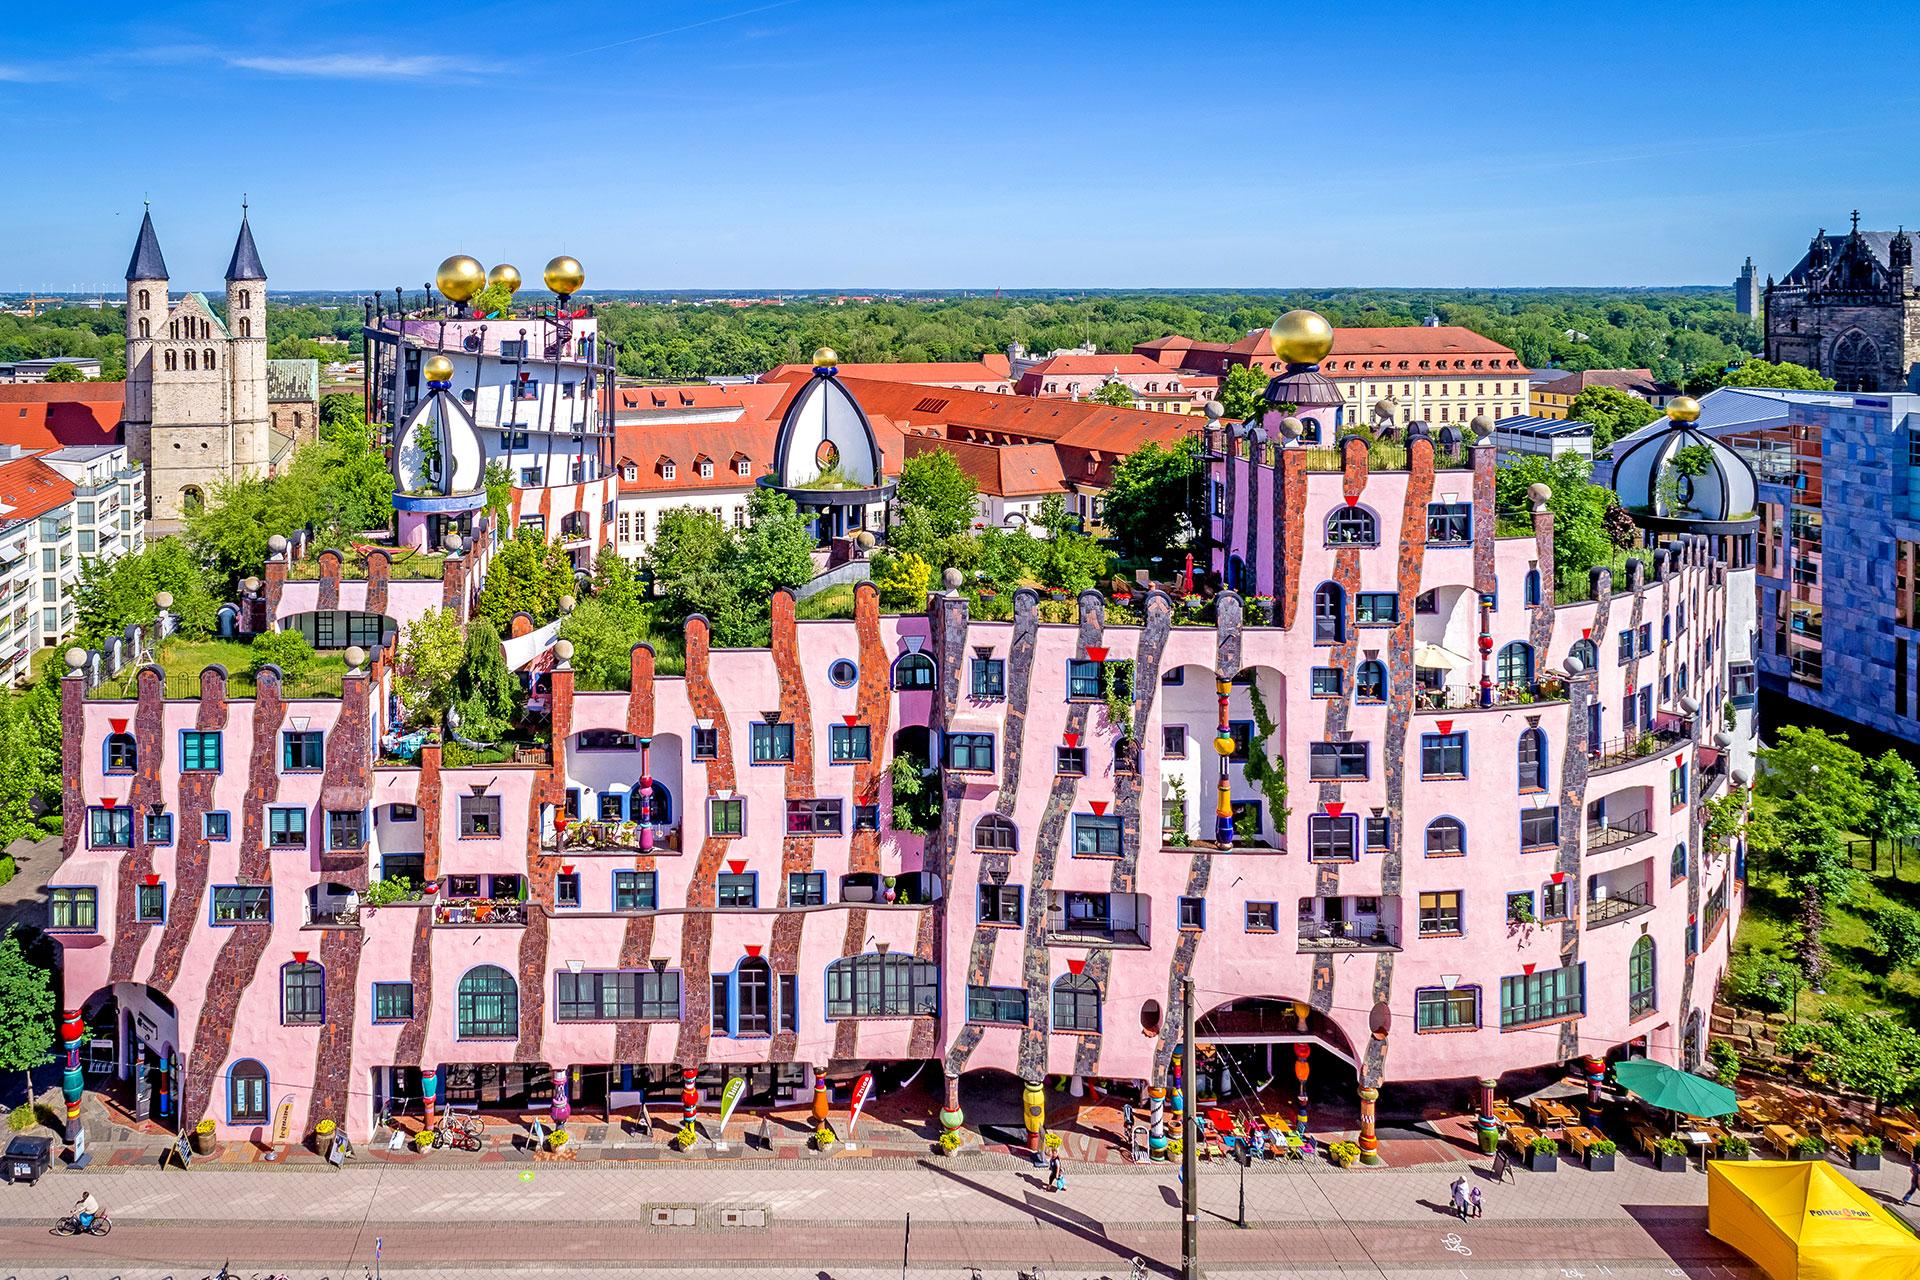 Loburg Umgebung Zitadelle Magdeburg